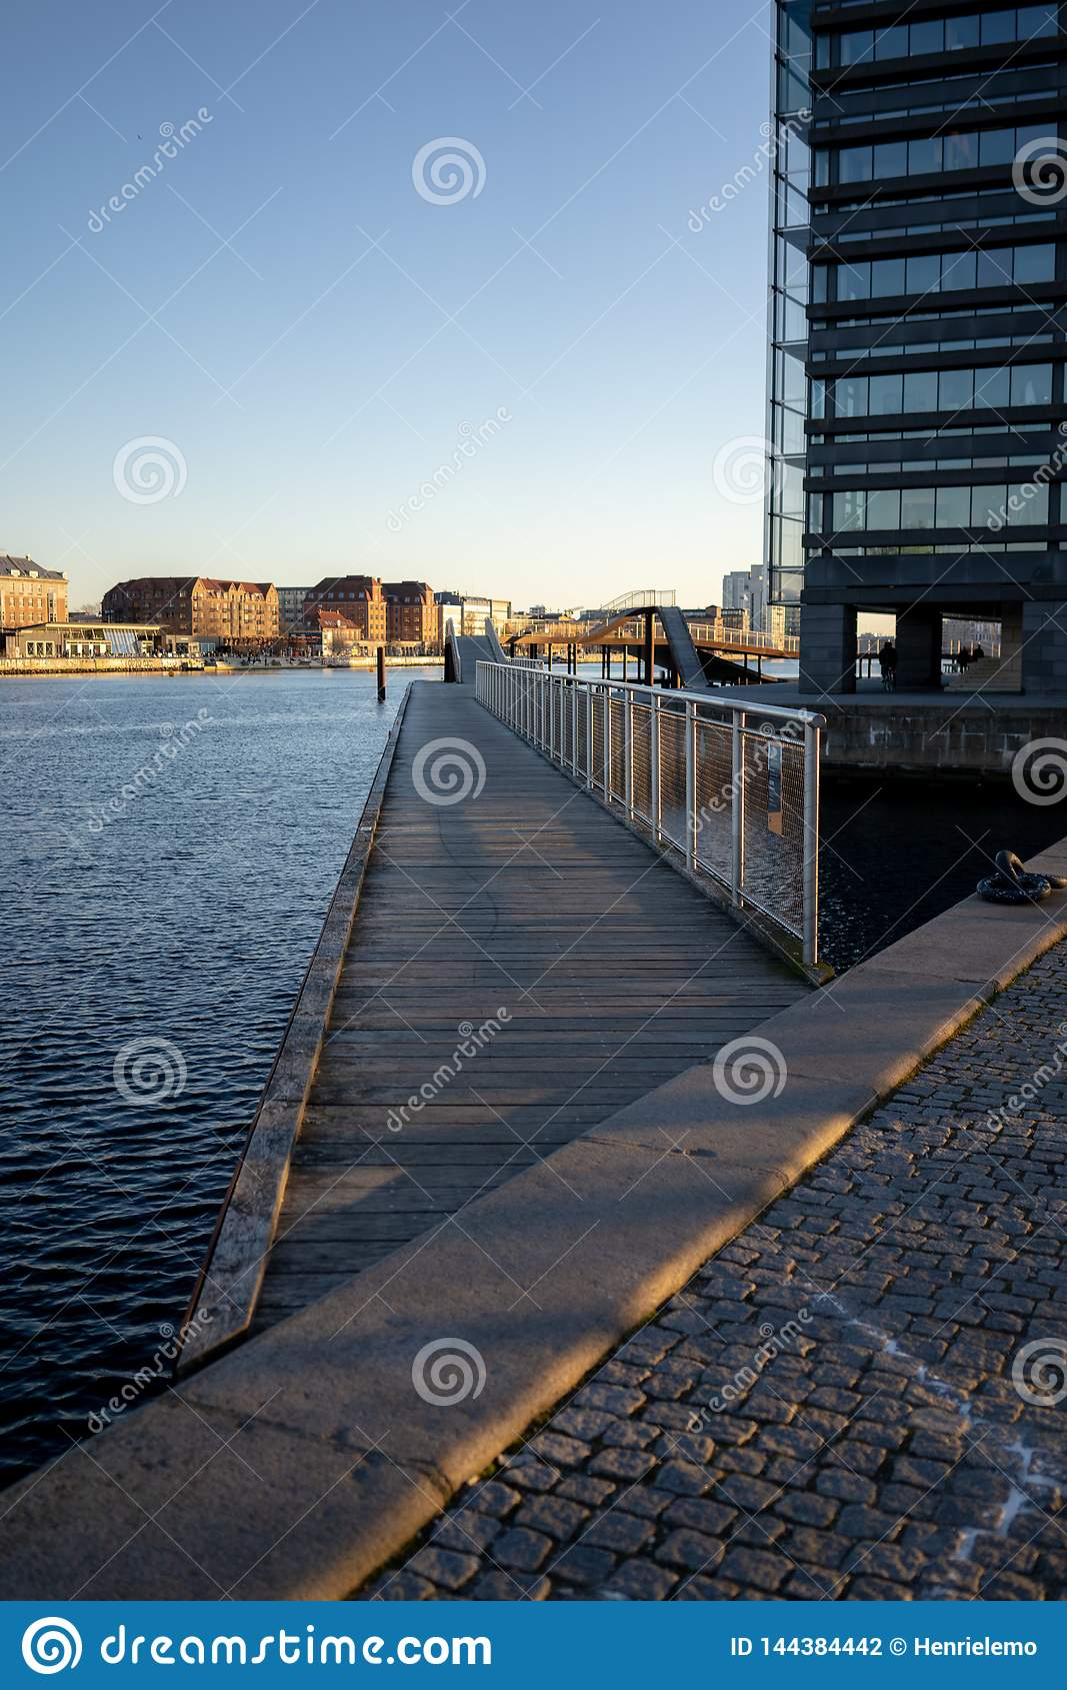 Copenhagen, Denmark - April 1, 2019: Kalvobod bridge which is a modern structure on constantly evolving architecture in Copenhagen